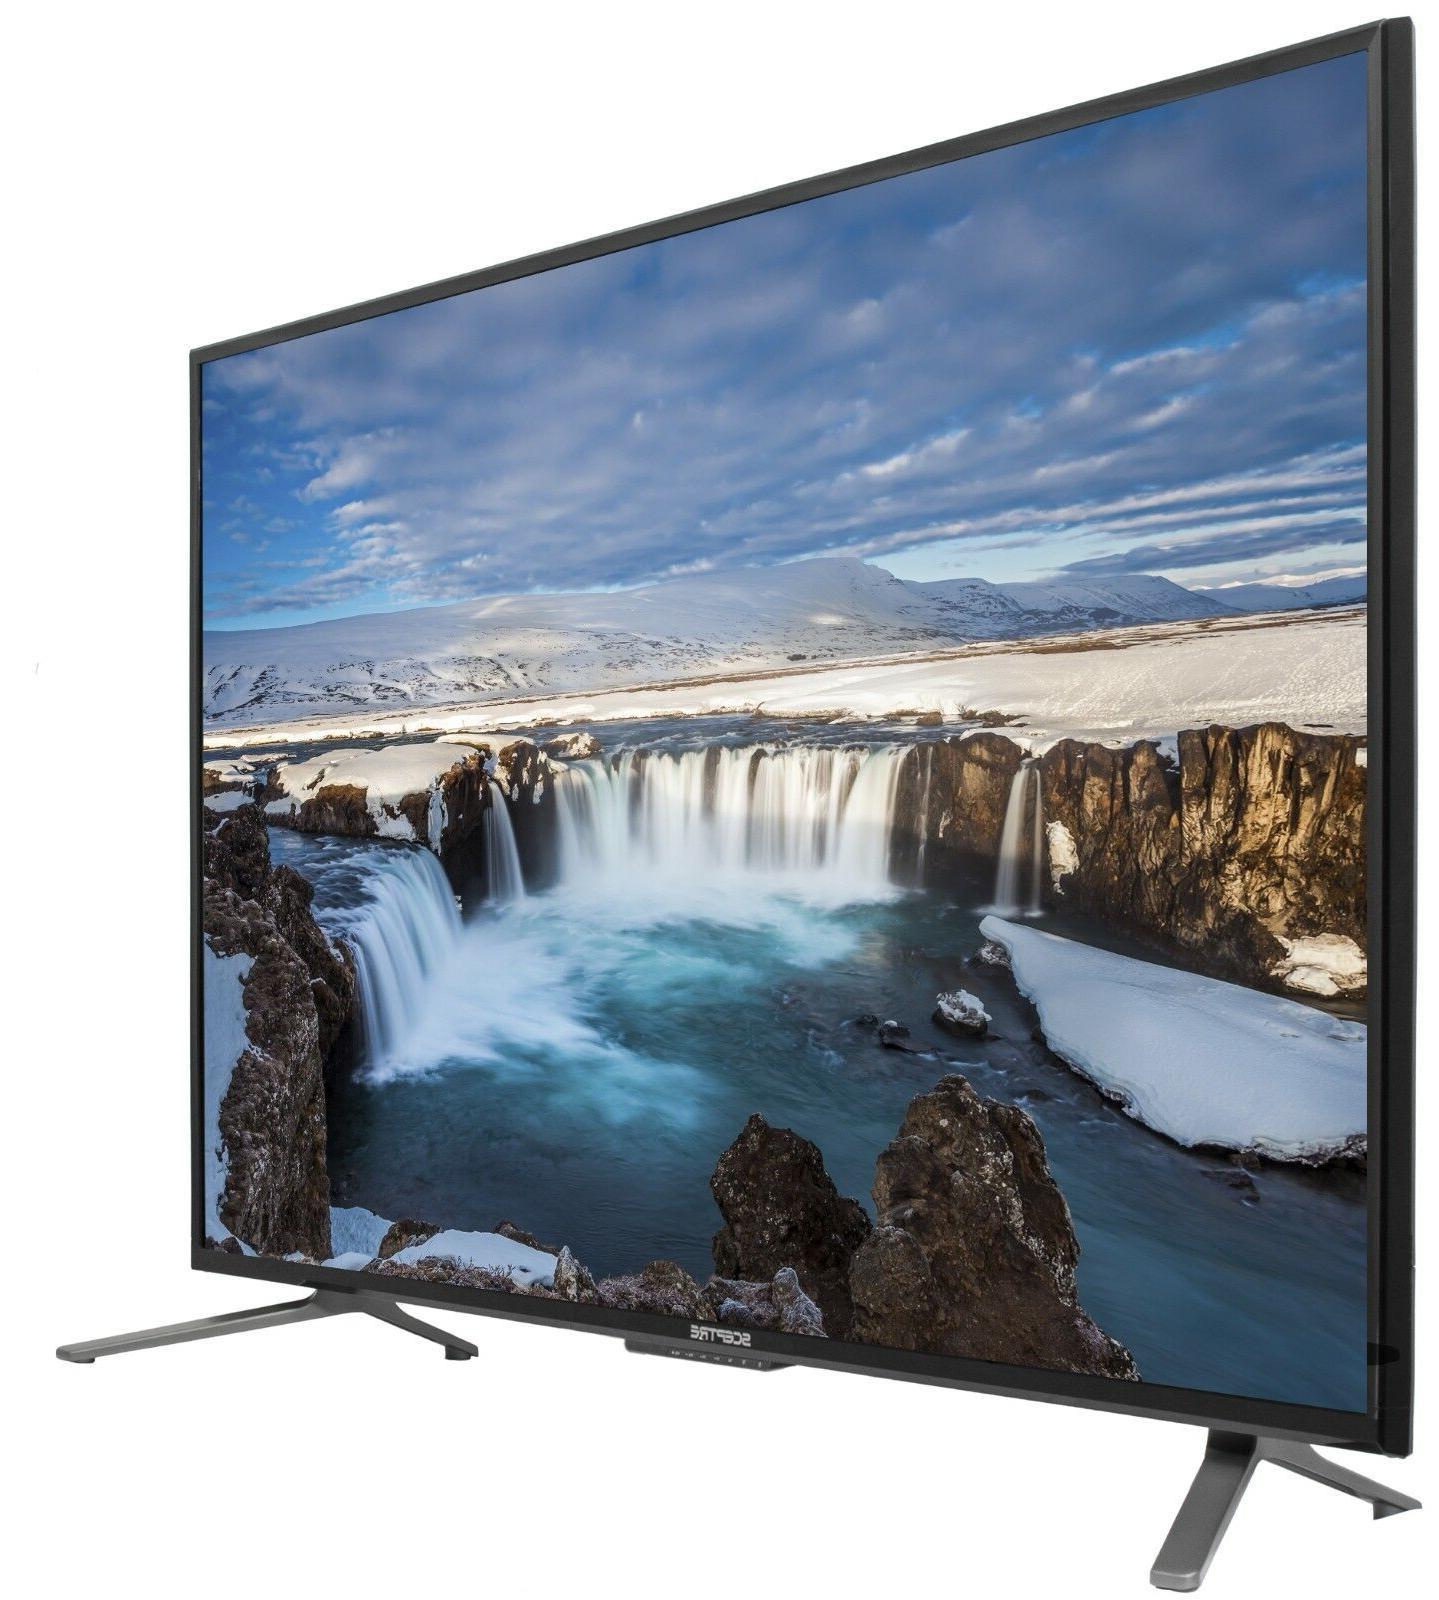 "55"" 4K Ultra HD LED TV HDTV  Slim Flat Screen 2160p UHD Scep"